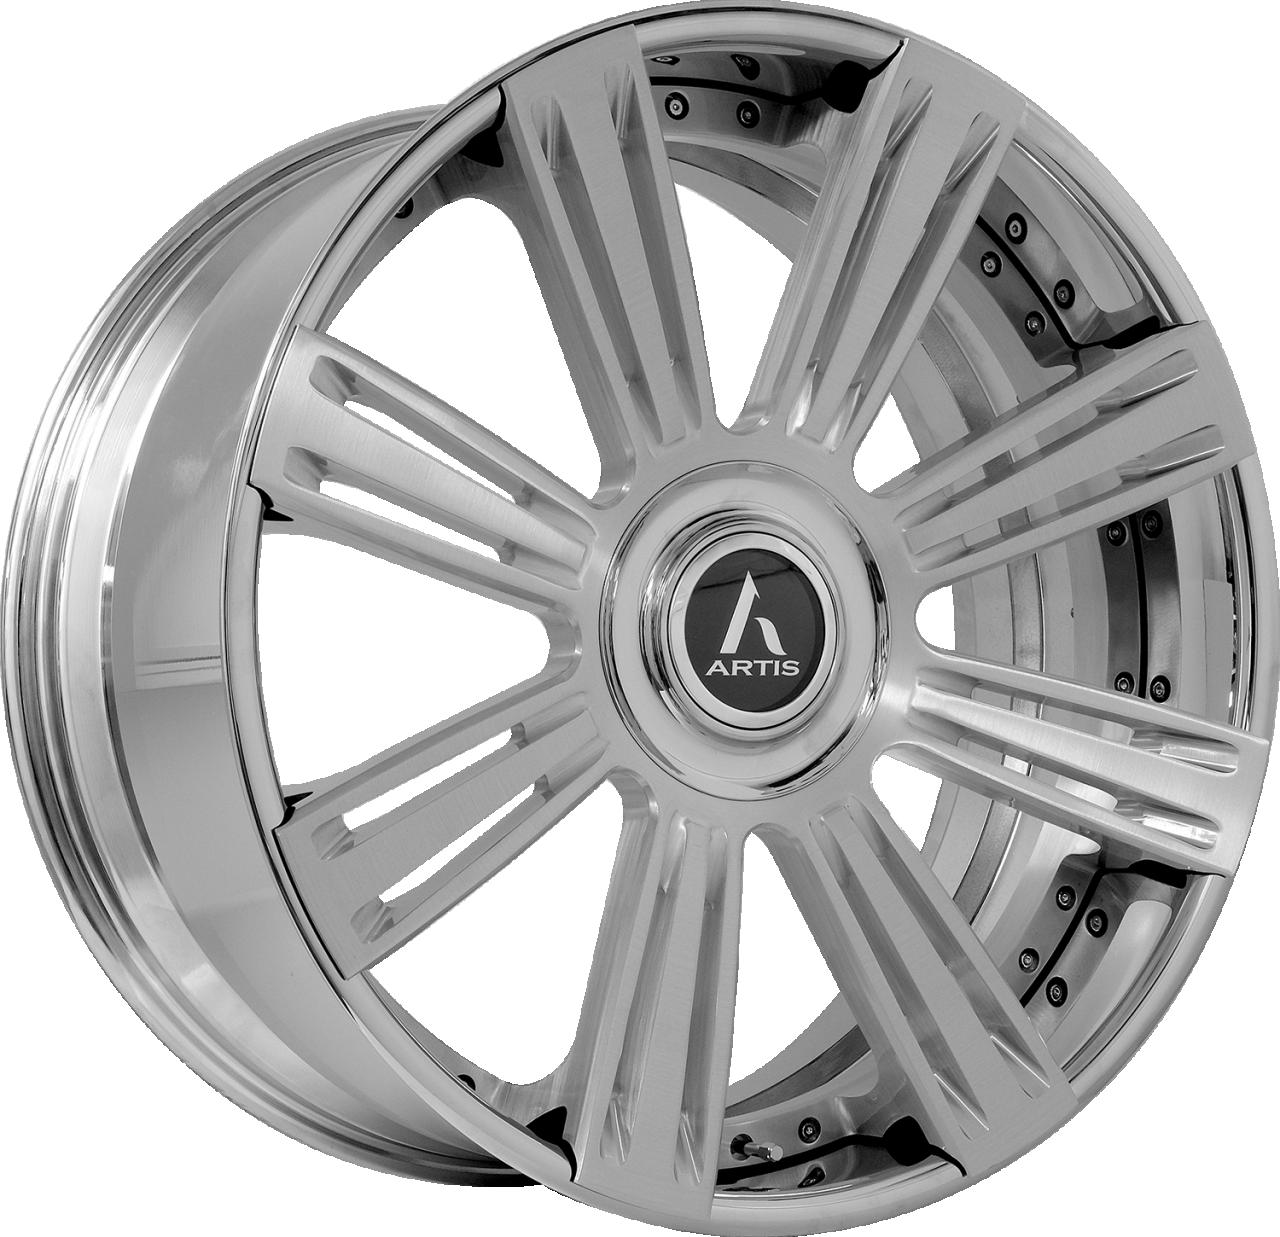 Artis Forged Grino wheel with Brushed finish